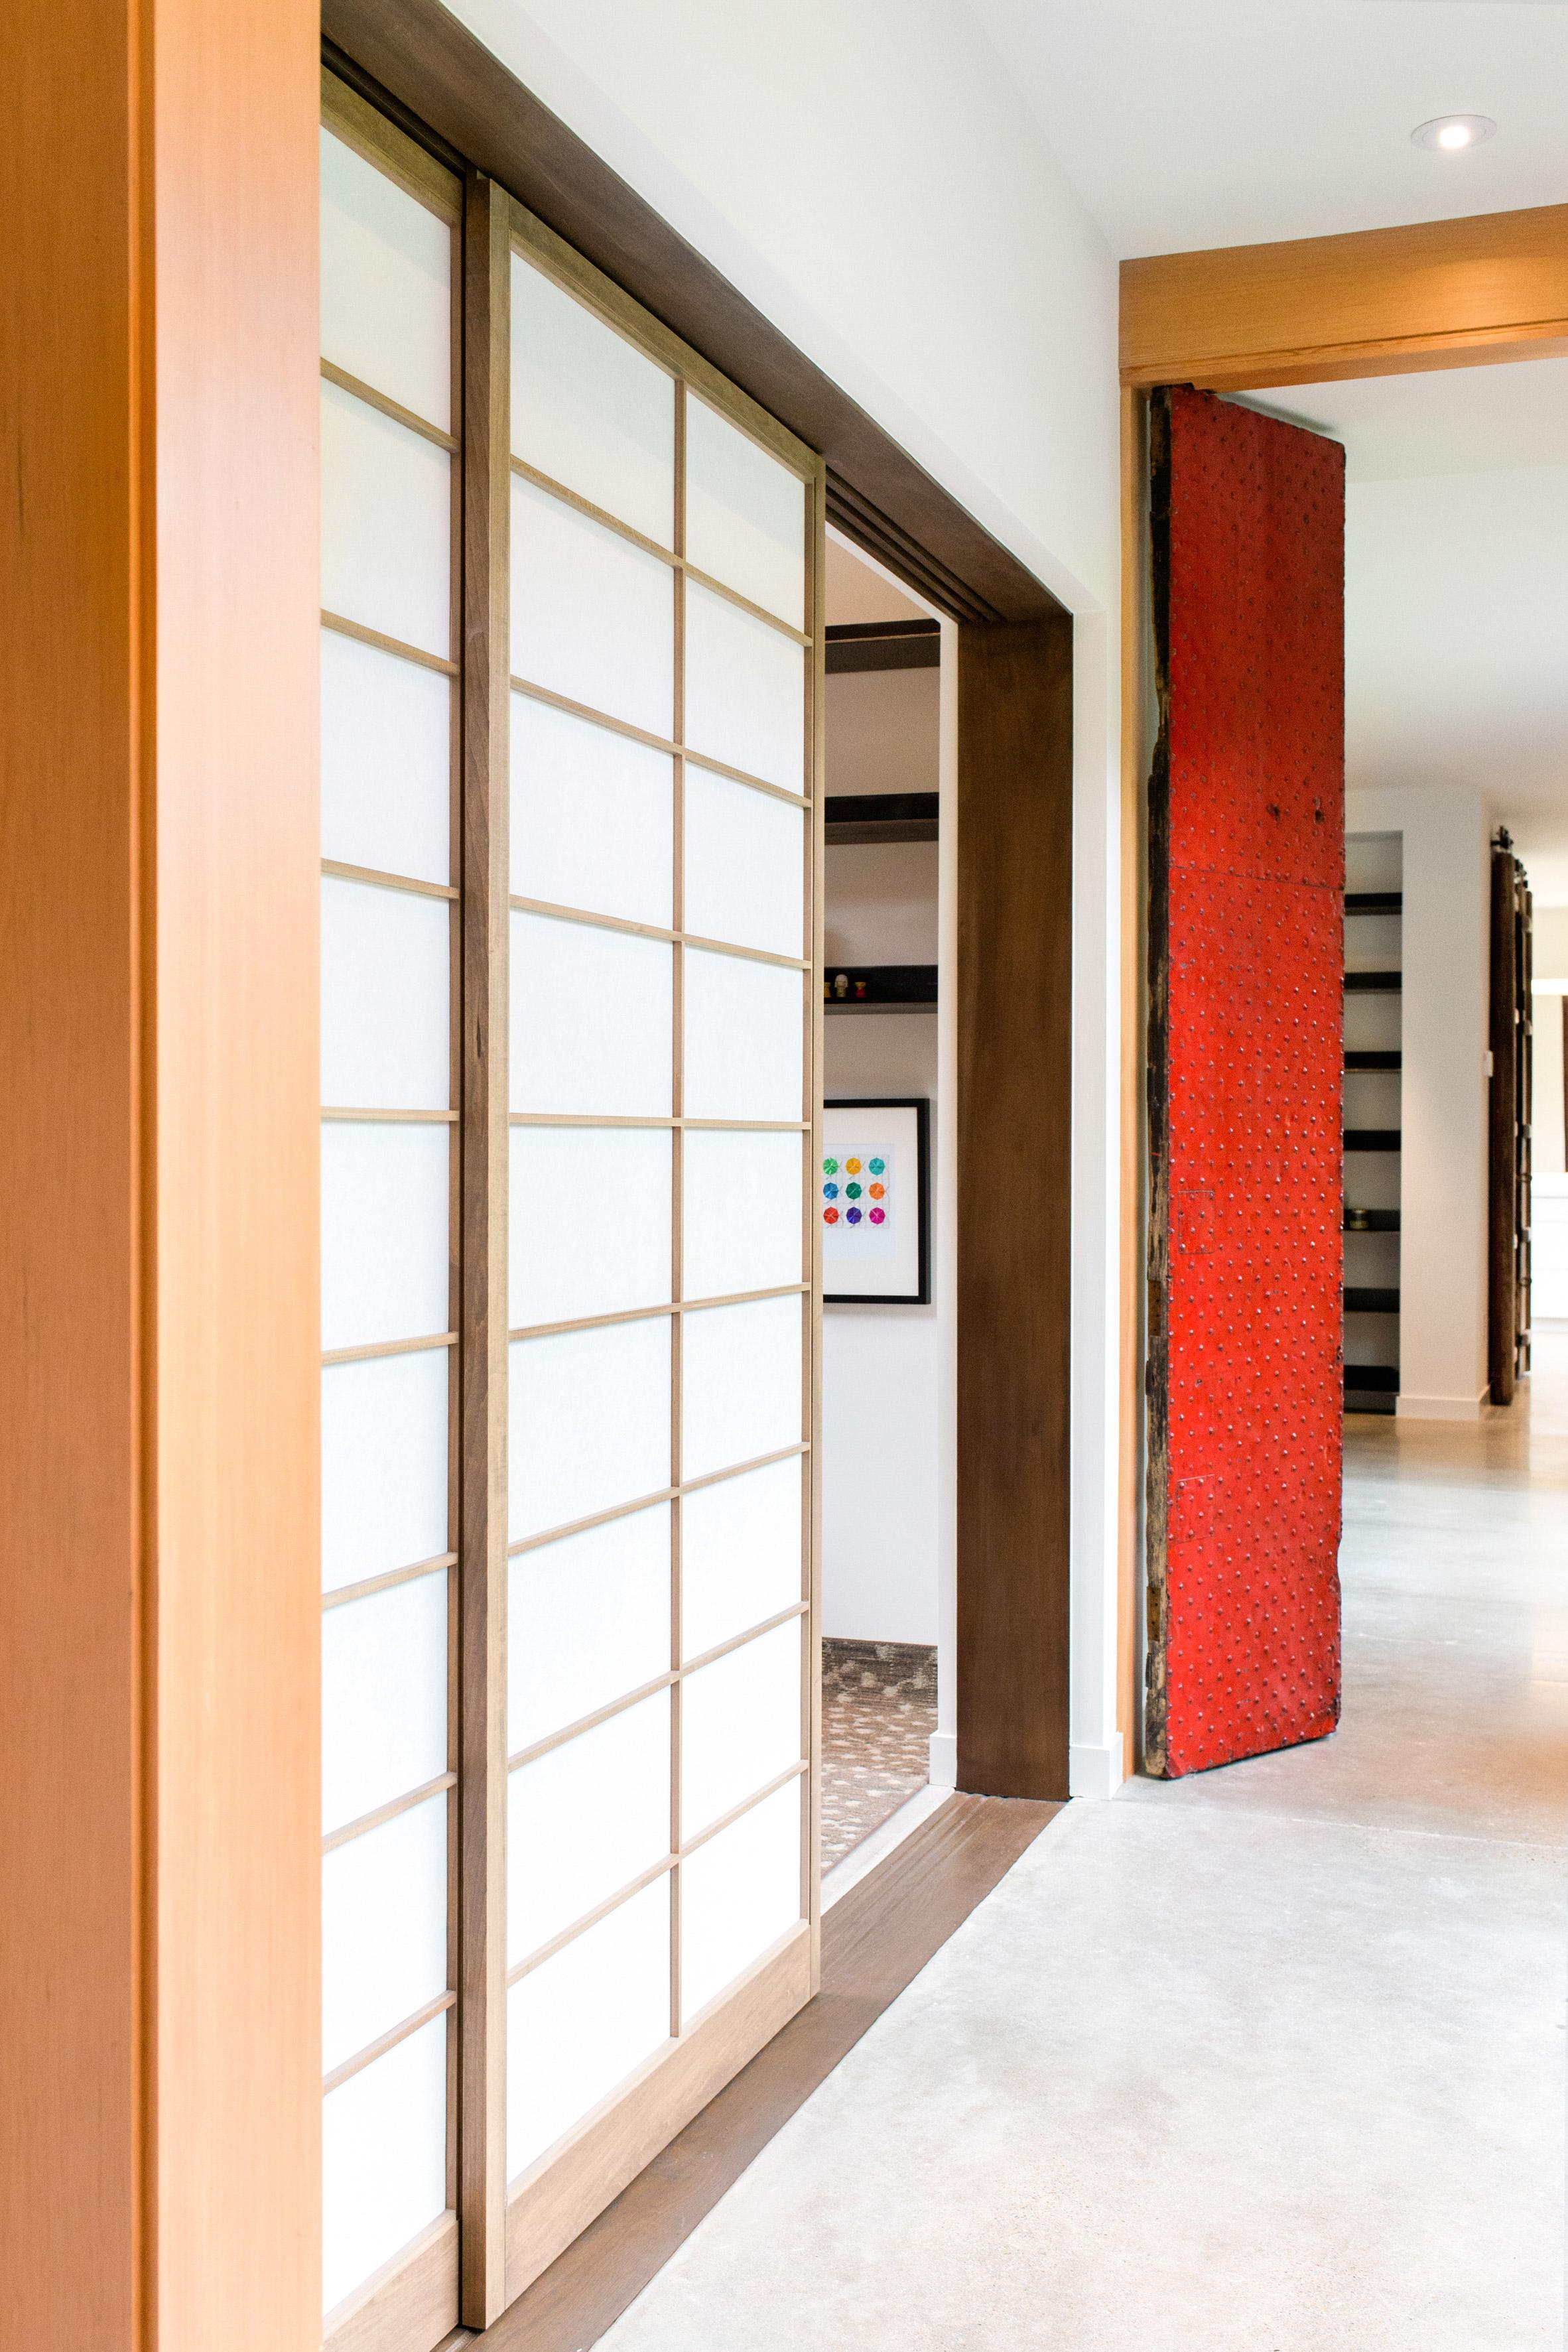 Shou Sugi Ban House, Houston, Texas, by Suyama Peterson Deguchi